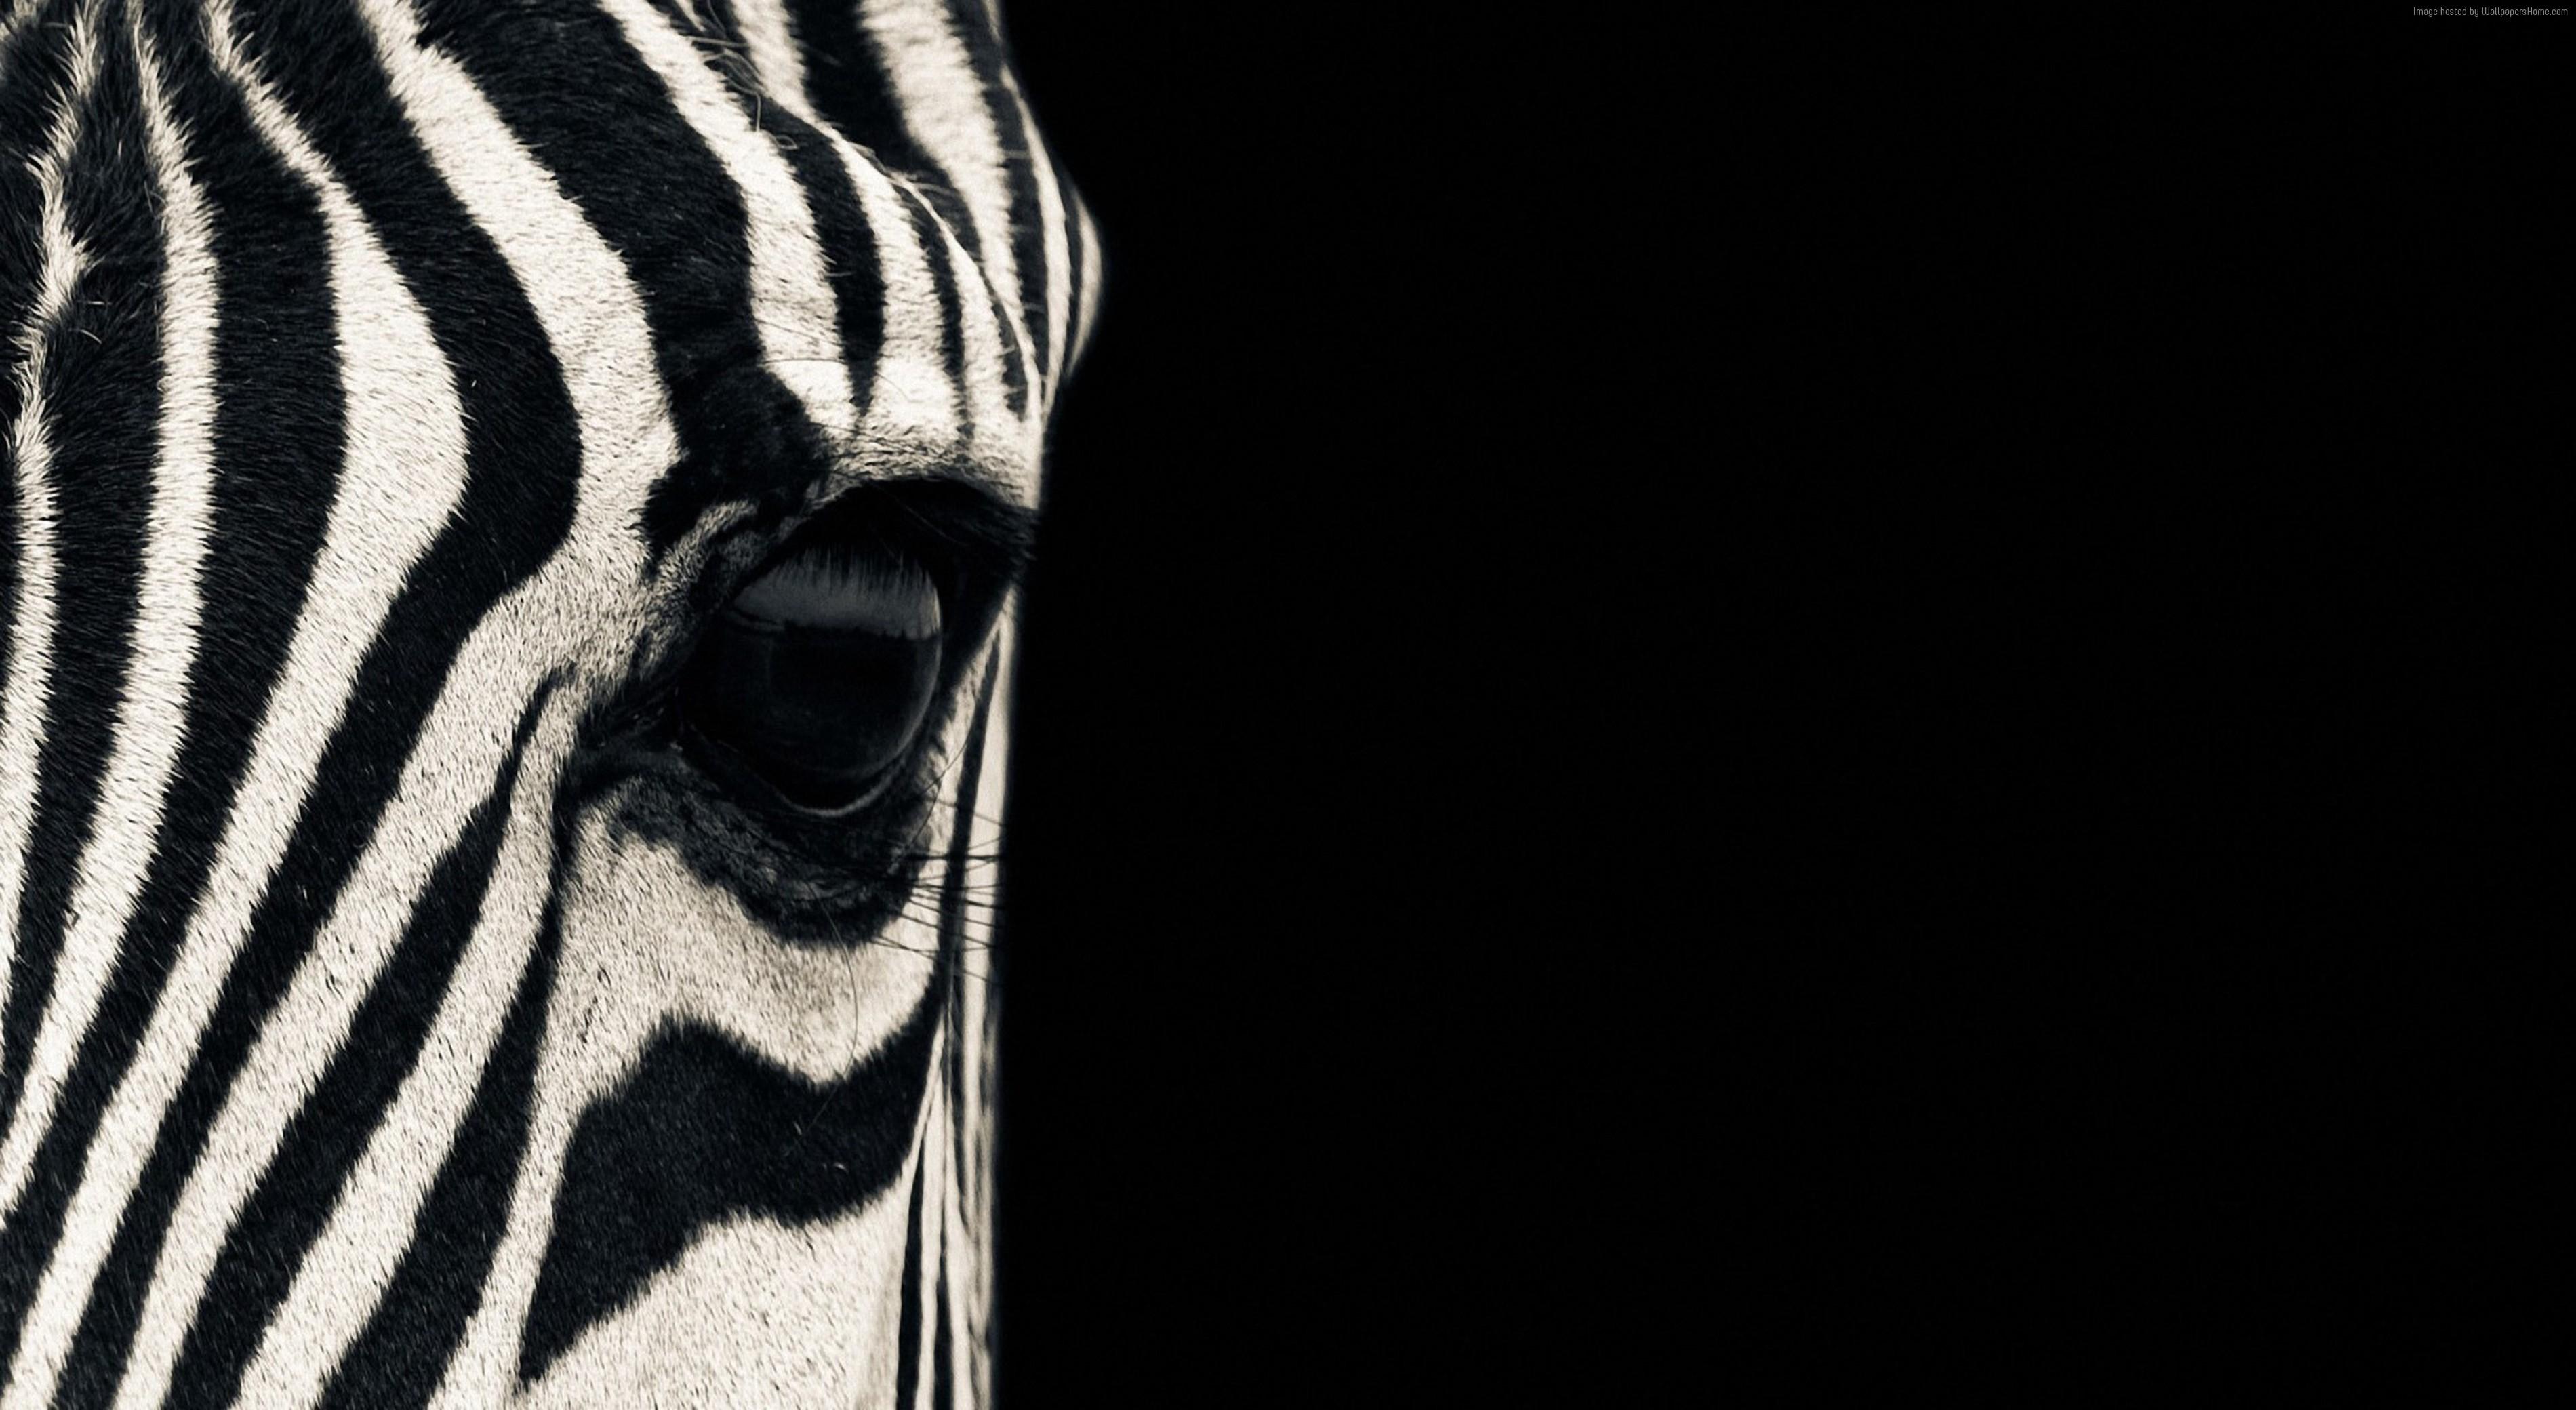 Black And White Animal Wallpaper JSC68Z7   Picseriocom 3800x2080